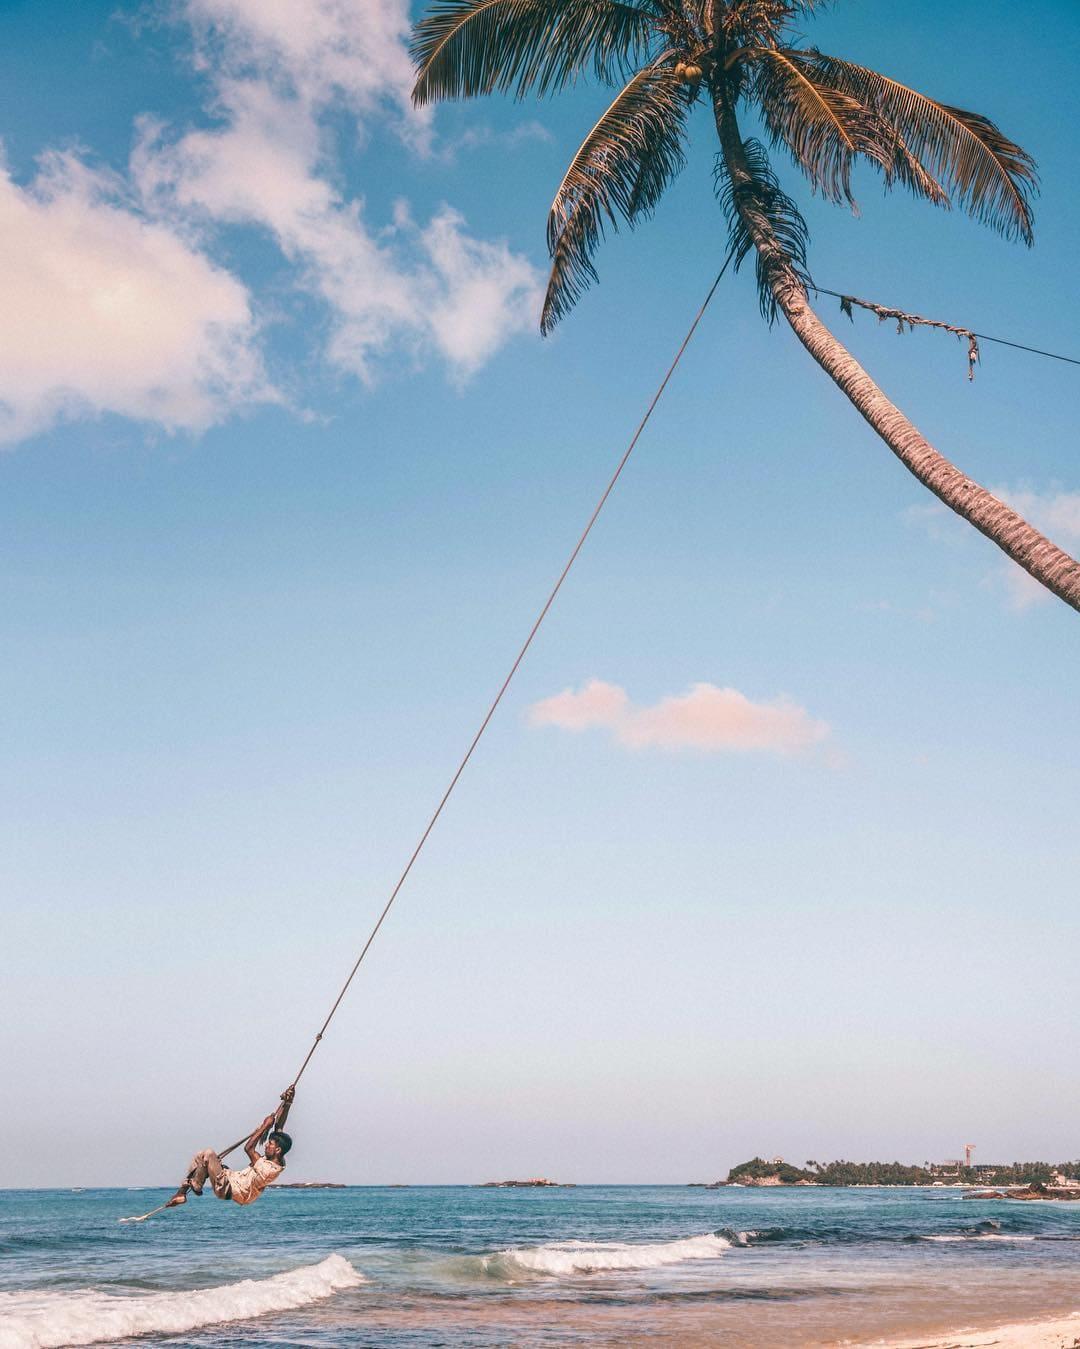 palm swing dalawella beach, Sri Lanka